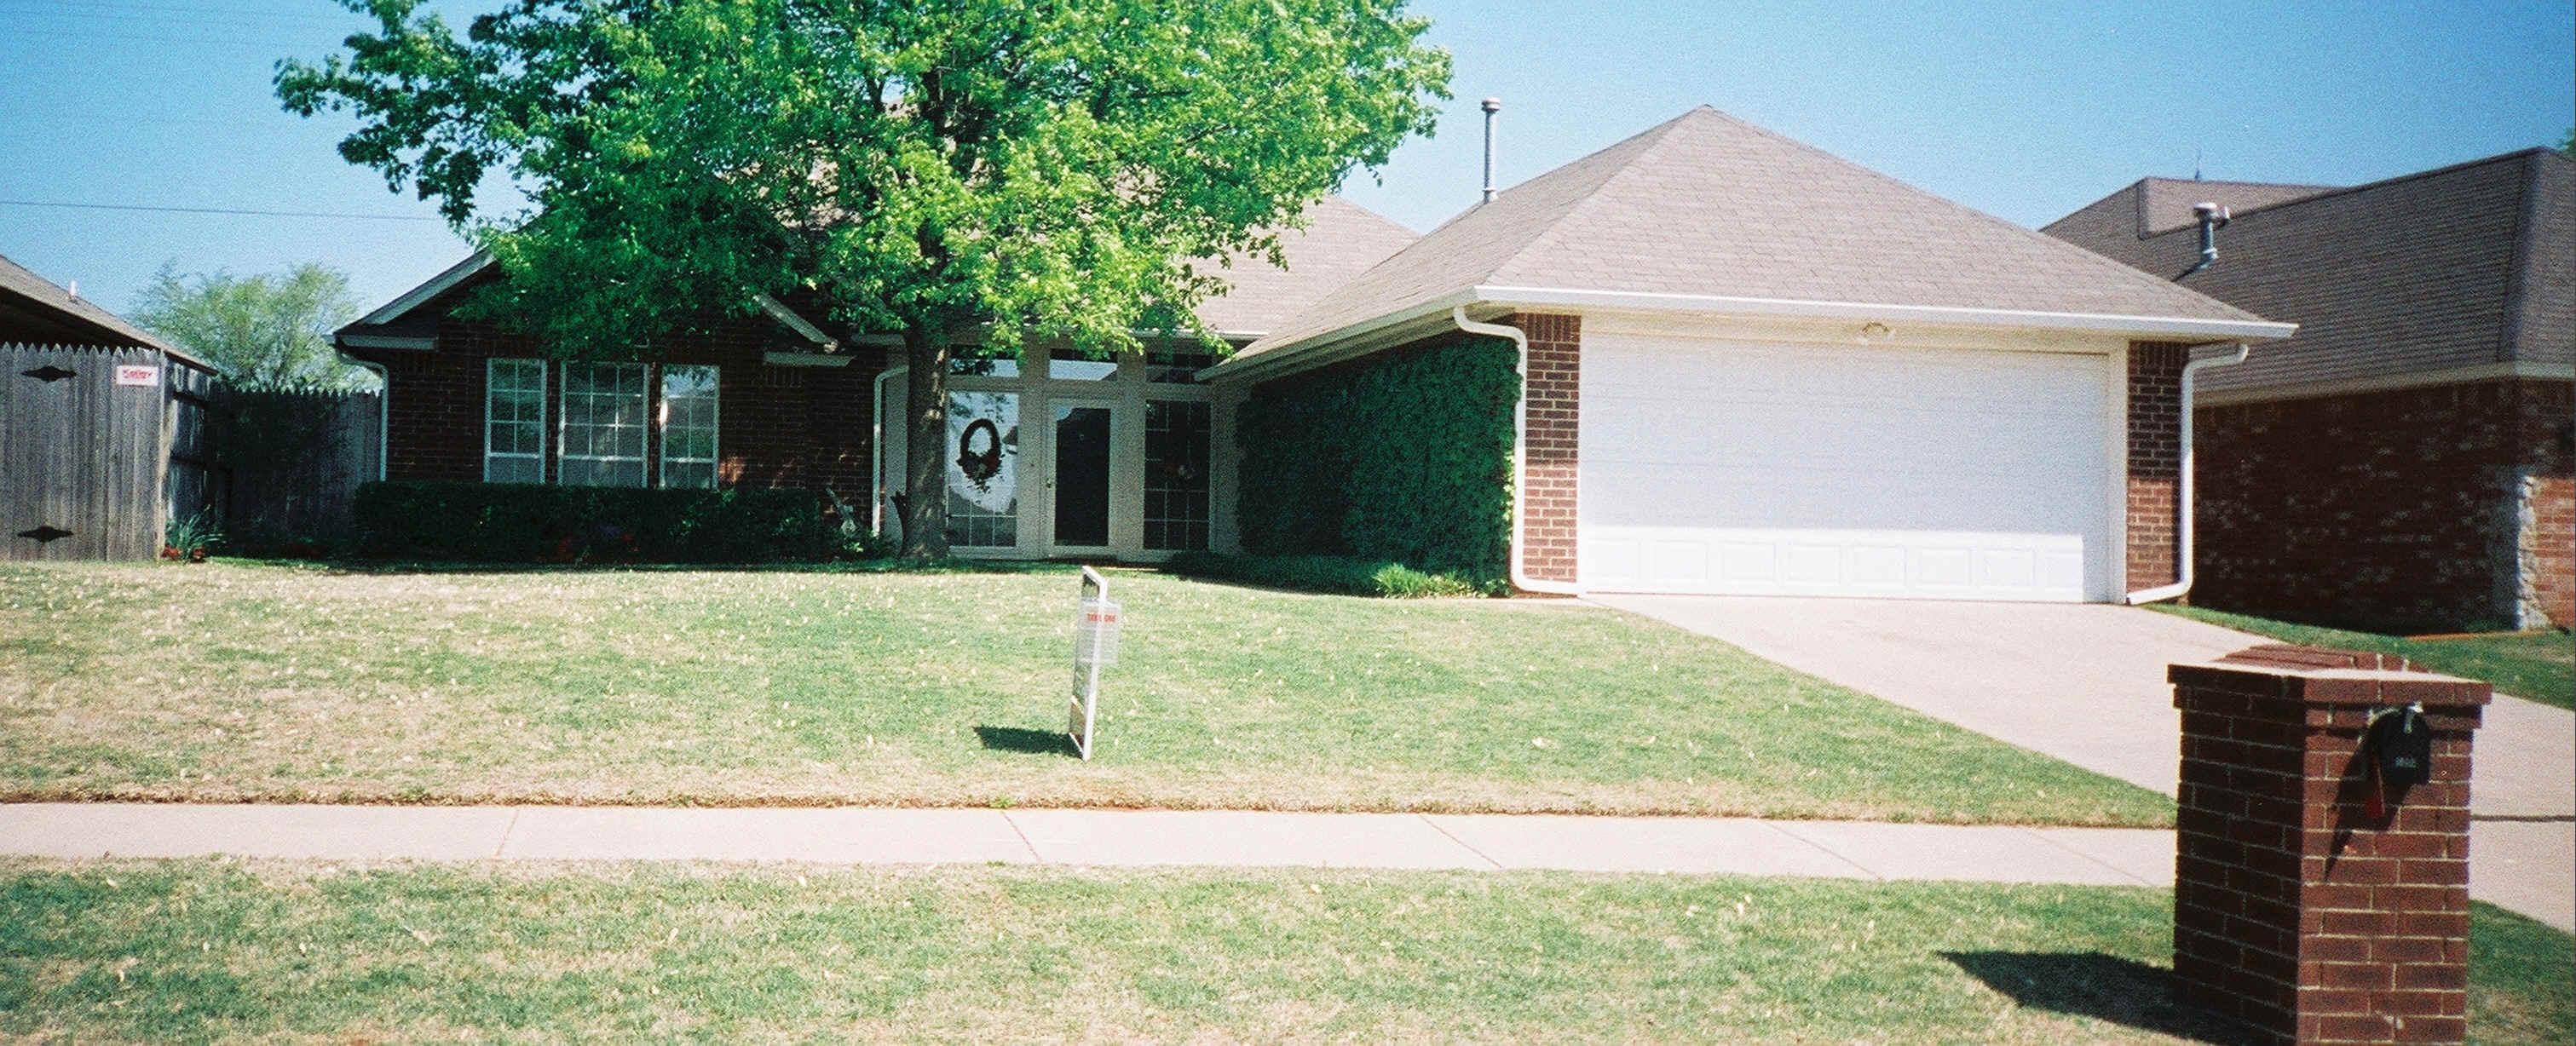 Rental Homes 2 Oklahoma City Home Rentals